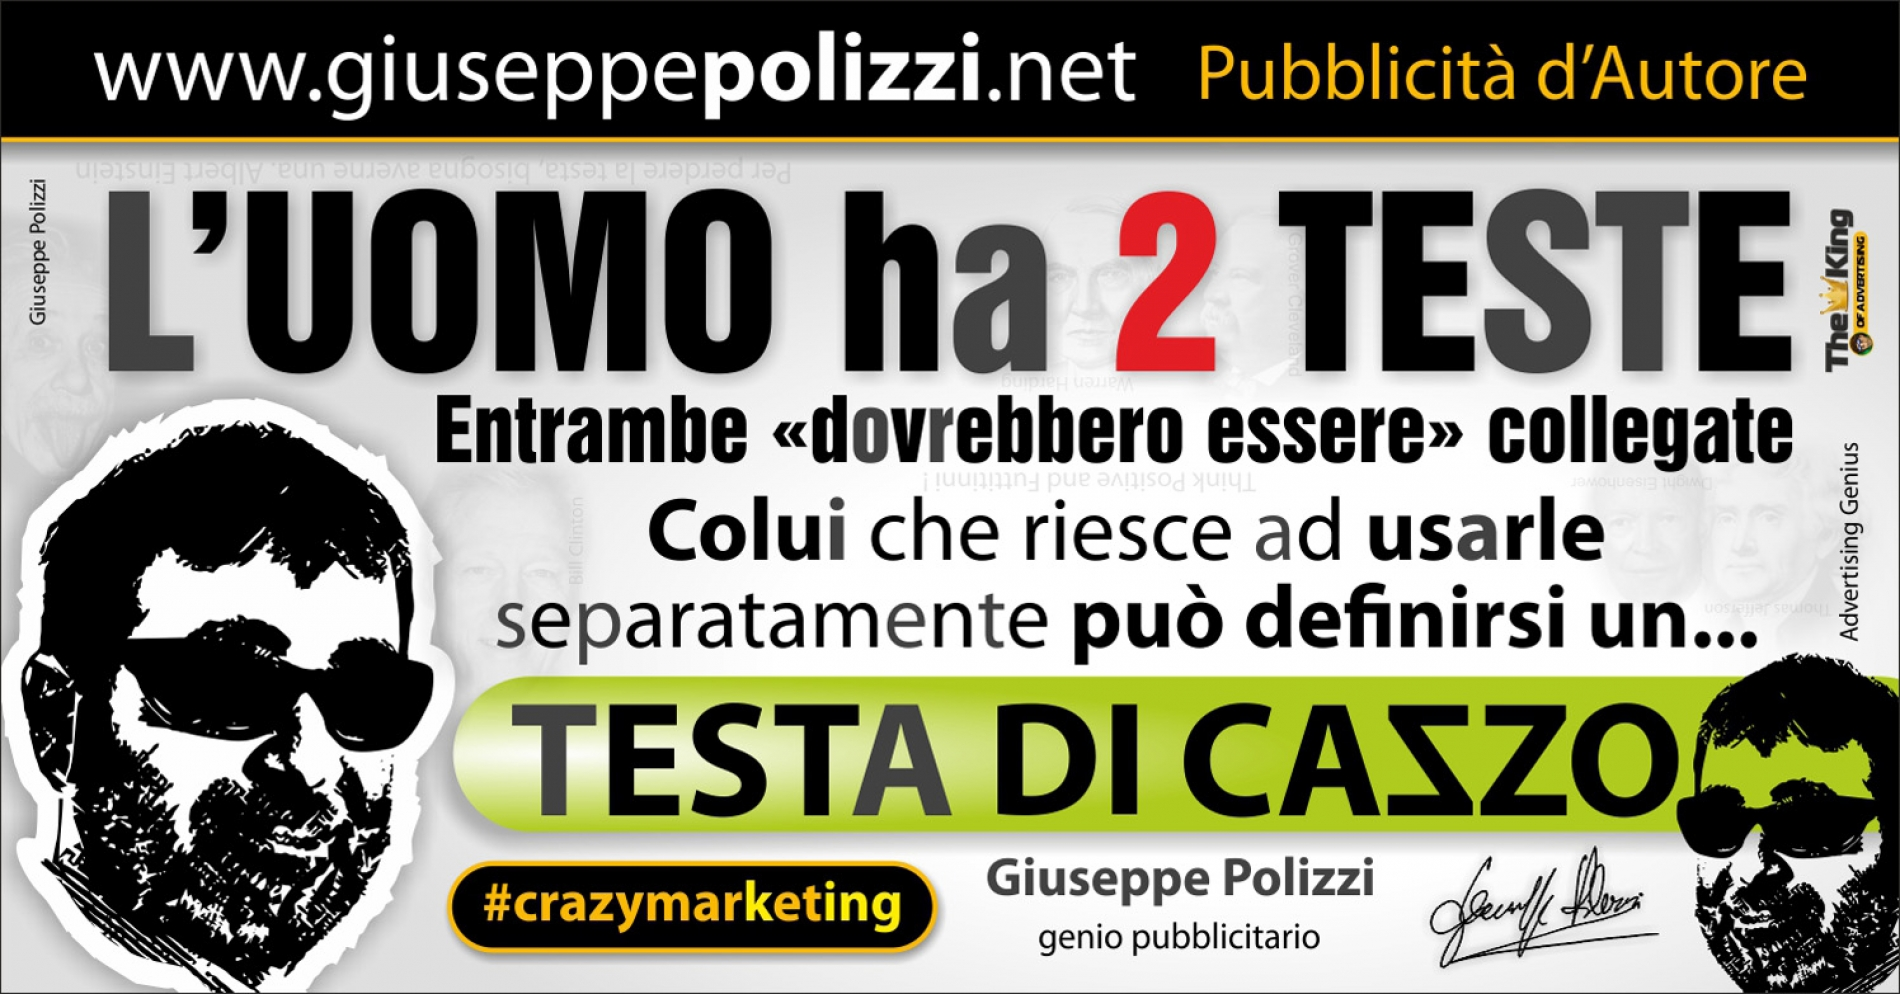 giuseppe polizzi aforismi usare la testa 2016 crazy marketing